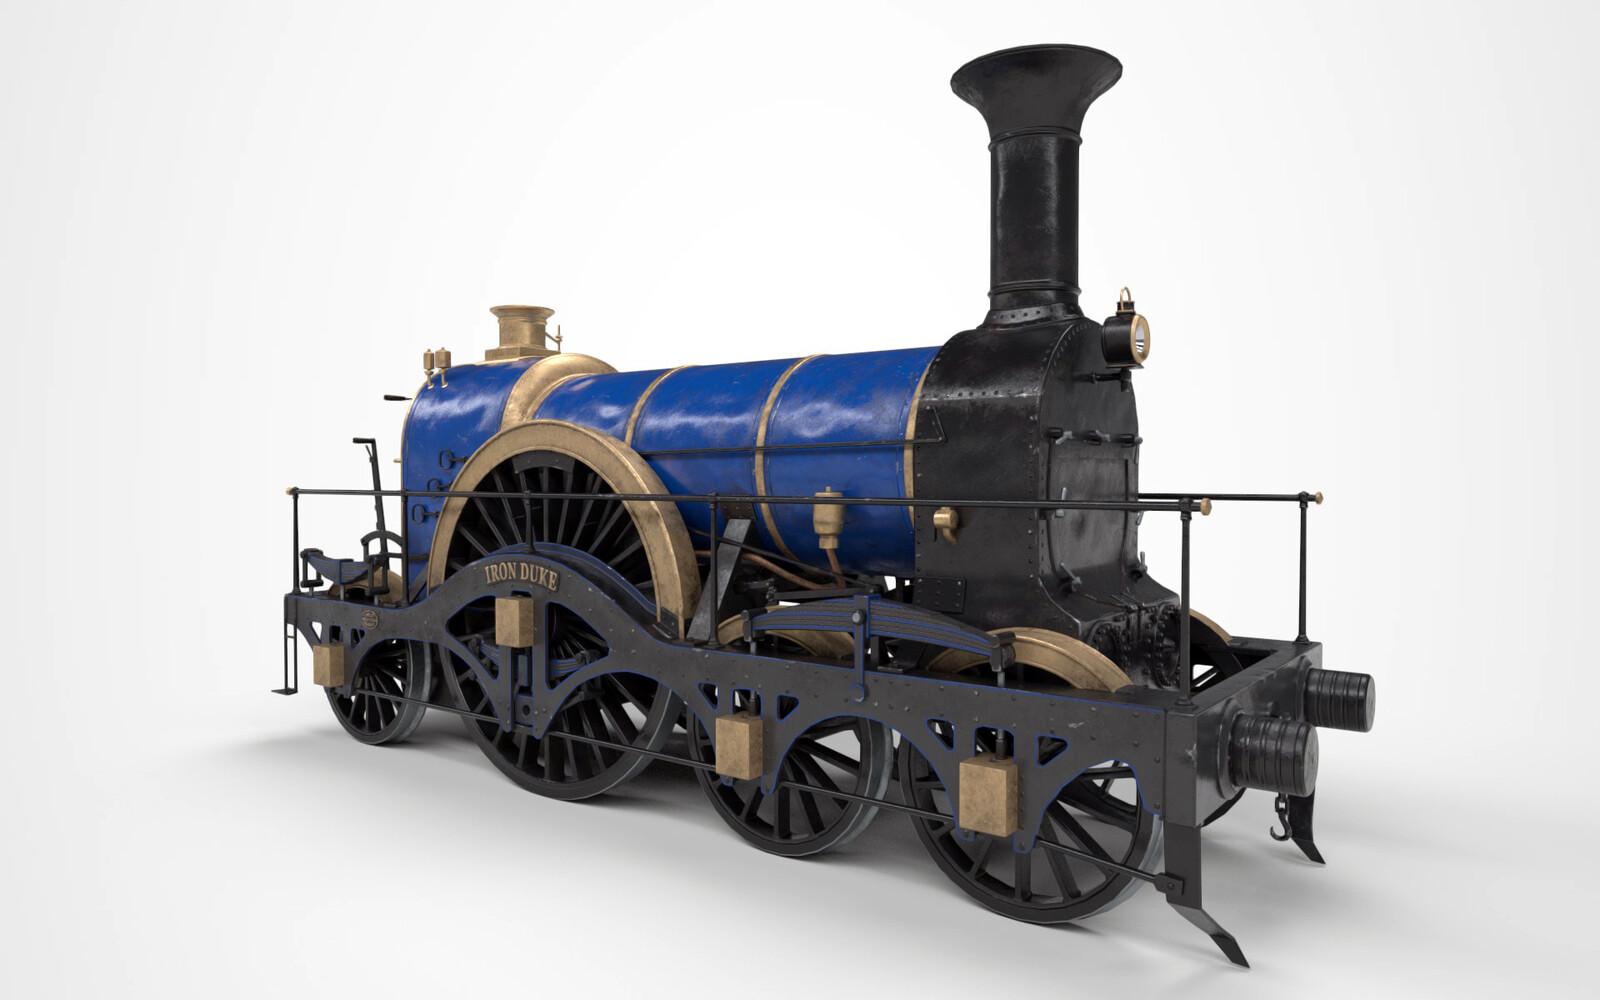 Iron Duke (historical train)